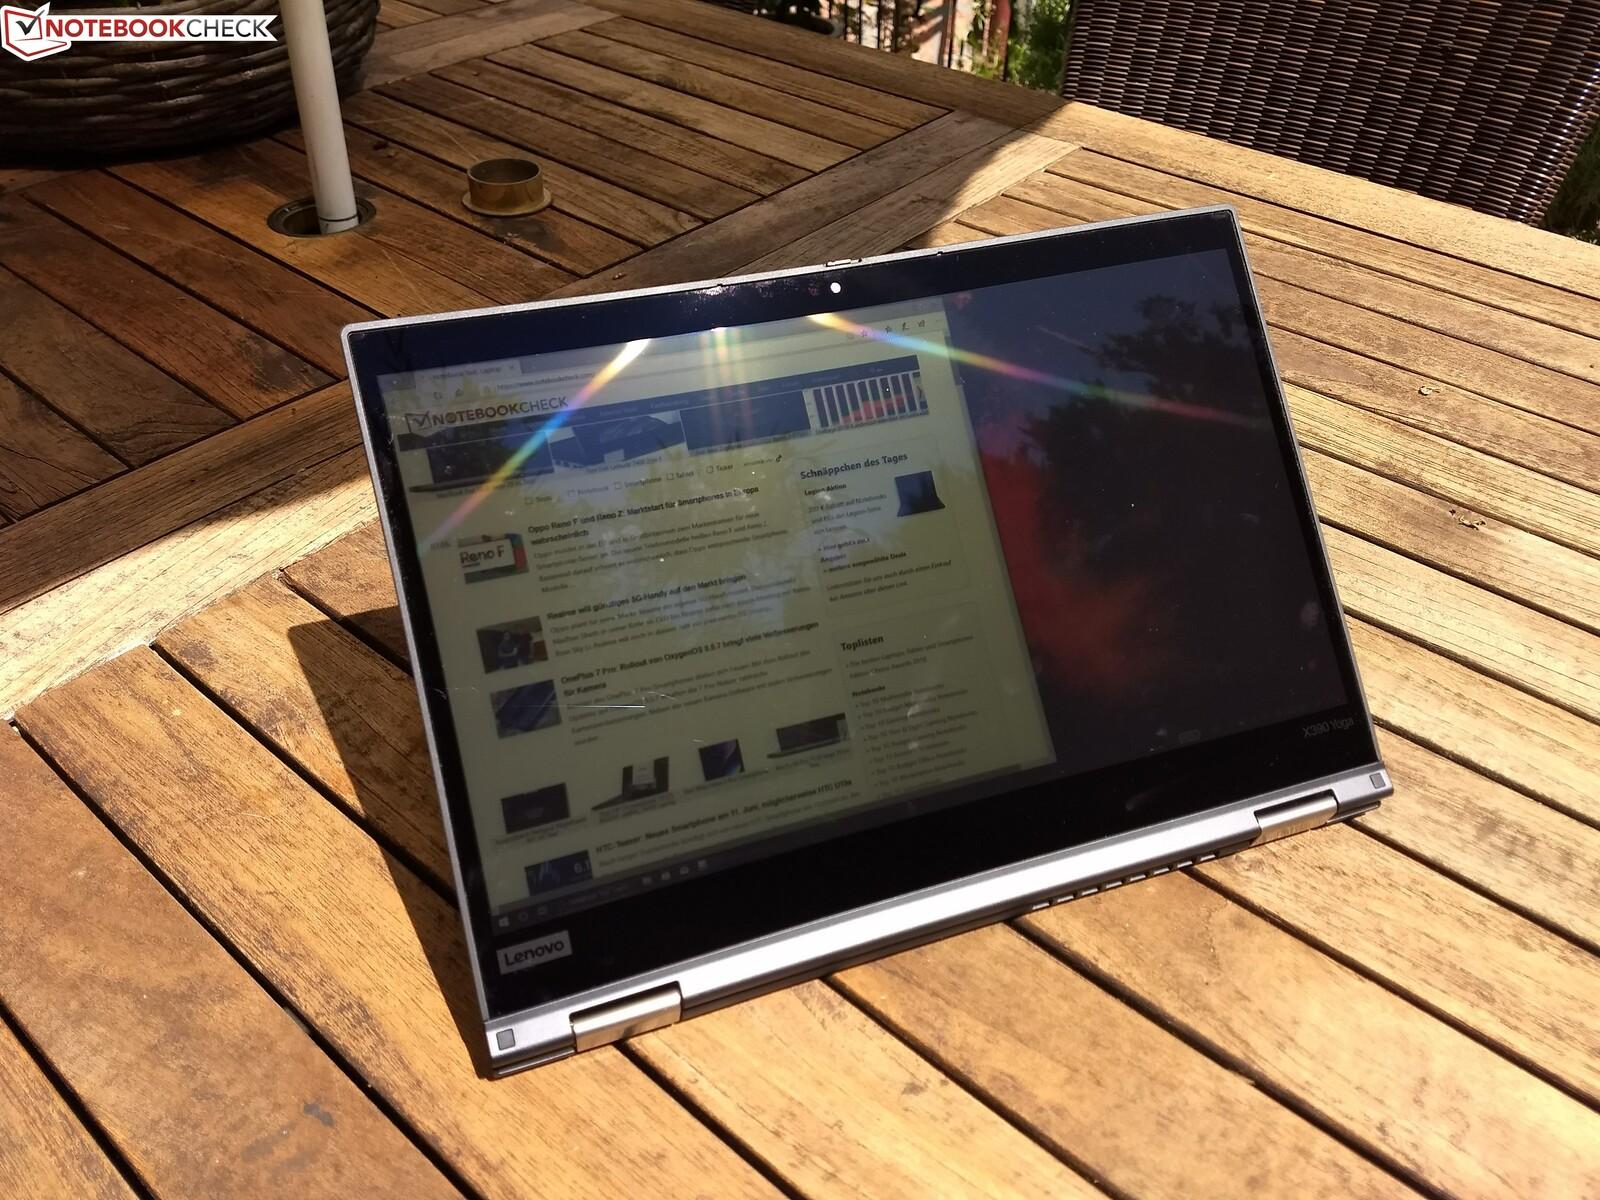 Ноутбук Lenovo ThinkPad X390 Yoga (i7, FHD)  Обзор от Notebookcheck